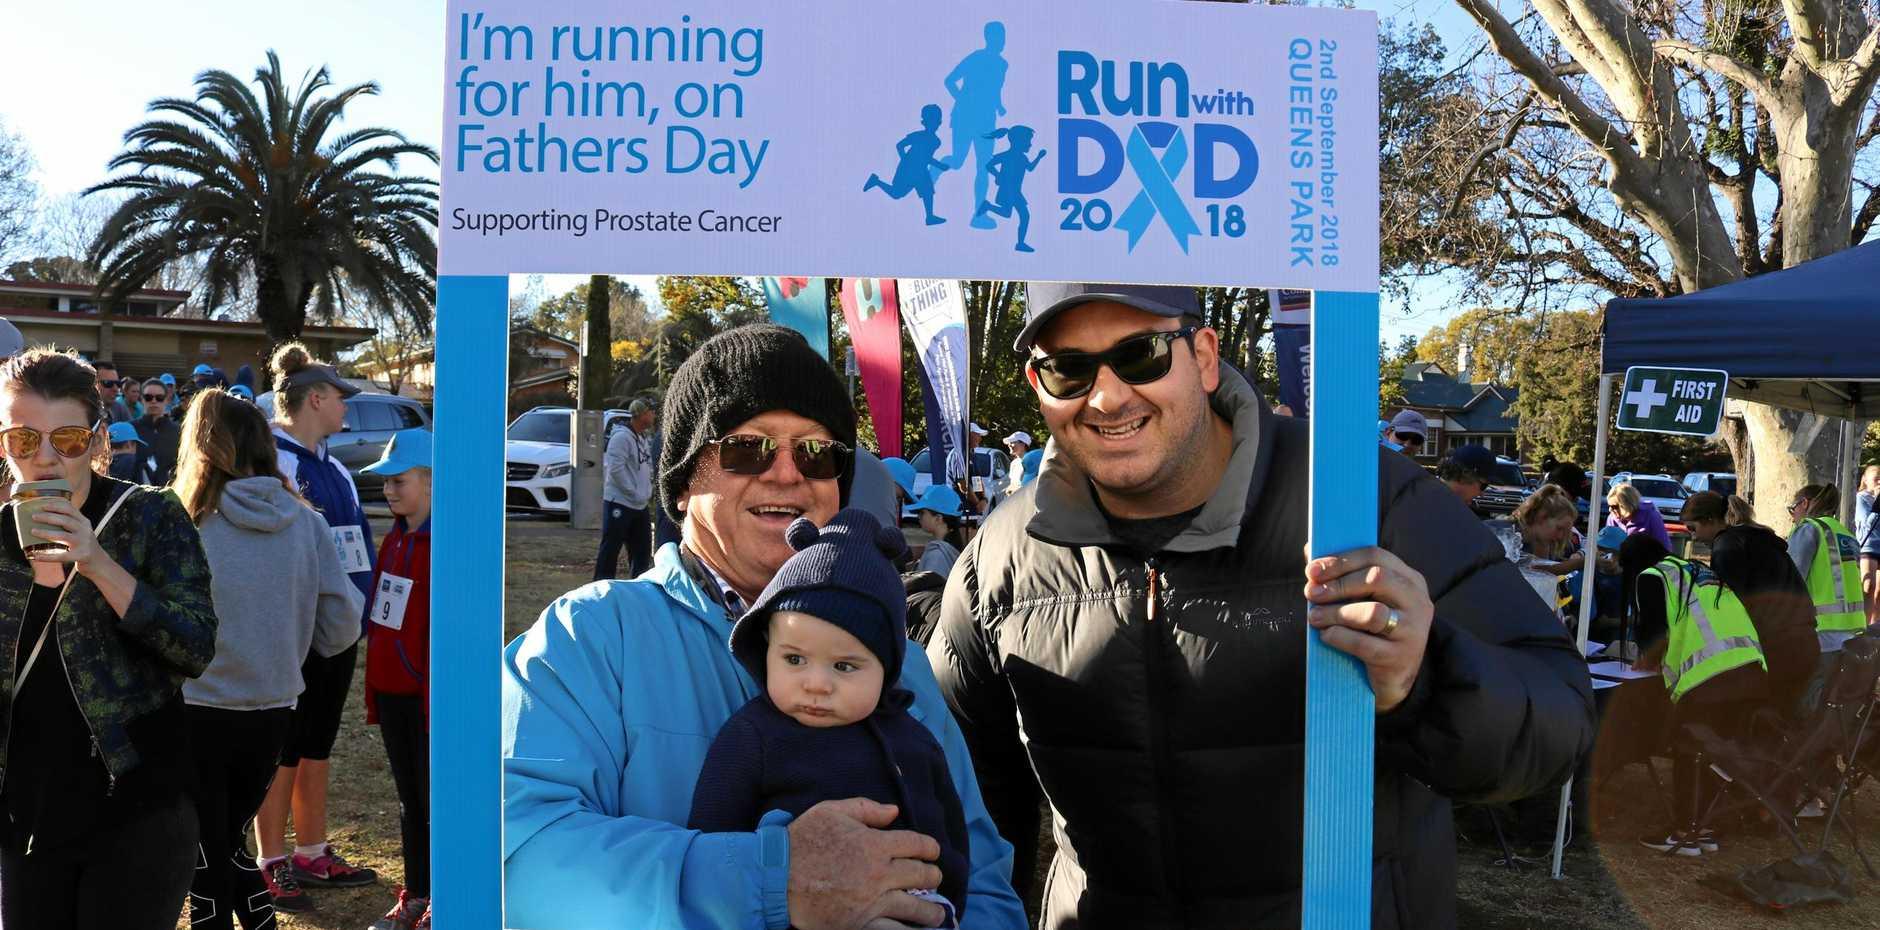 FUN RUN: Three generations of Toowoomba blokes (from left) grandfather Tim Ryan holding his grandson Huxley Ryan, next to his son Dominic Ryan, at the 2018 Run with Dad fun run.